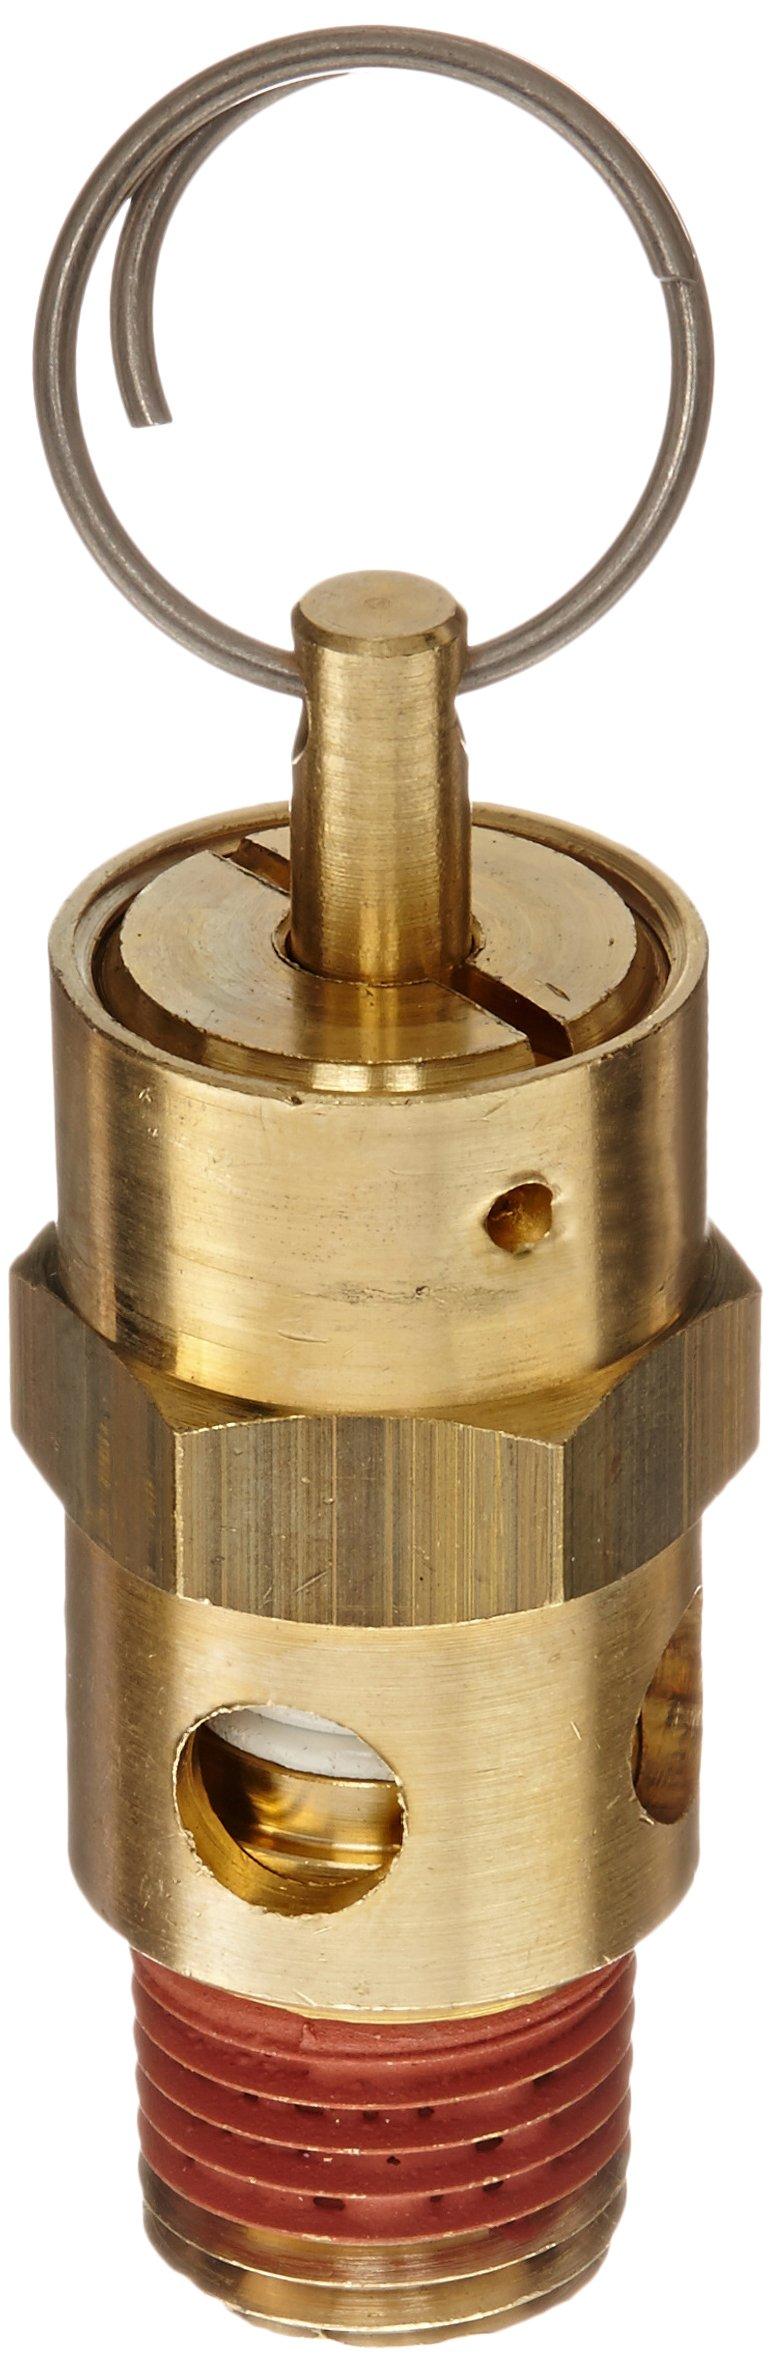 Control Devices ST Series Brass ASME Safety Valve, 150 psi Set Pressure, 1/4'' Male NPT